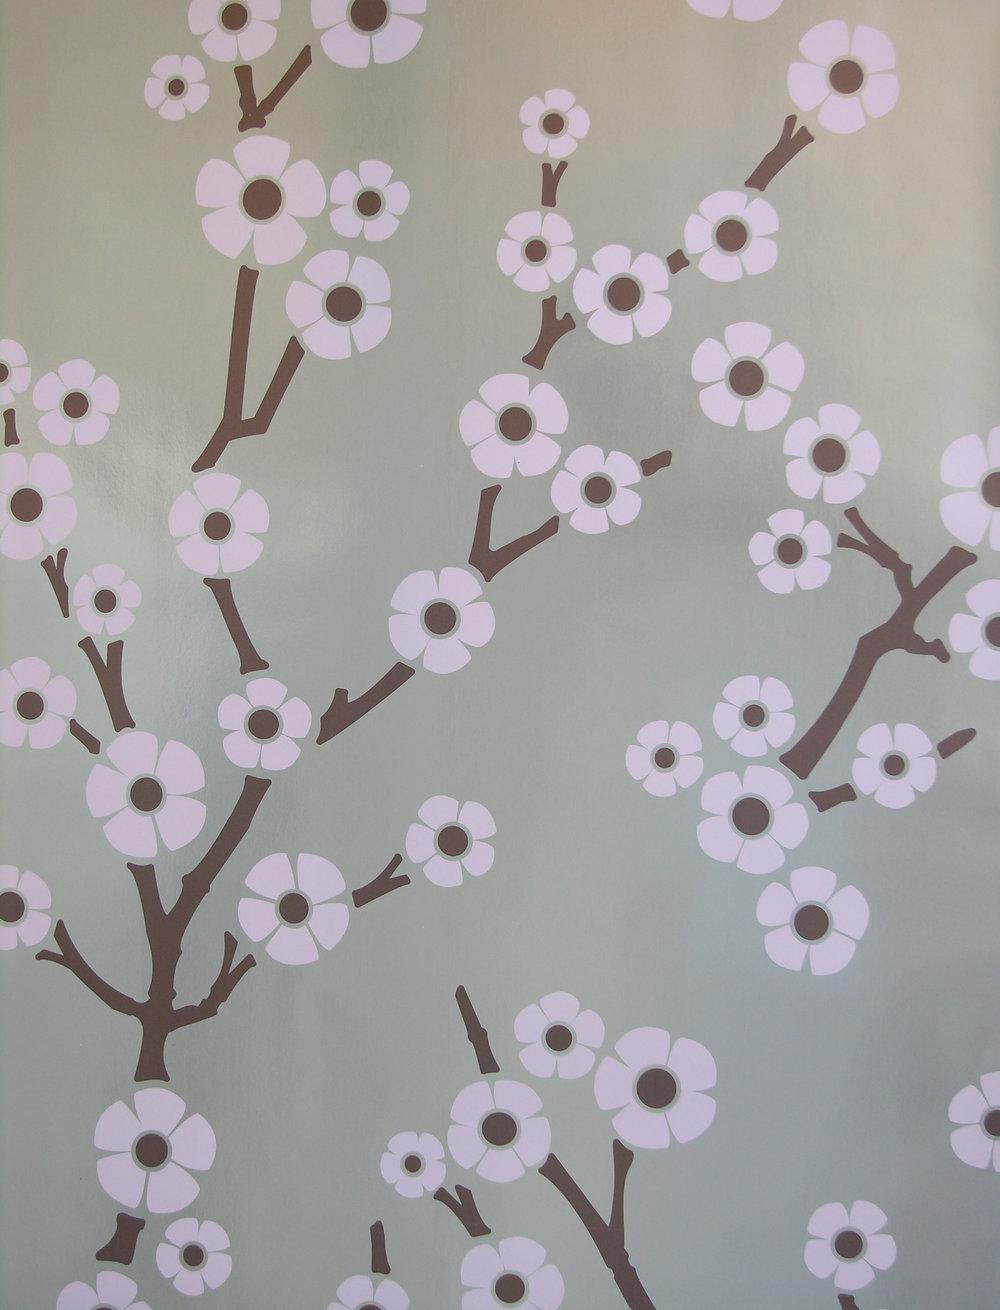 Sakura in Cherry Blossom (1).jpg